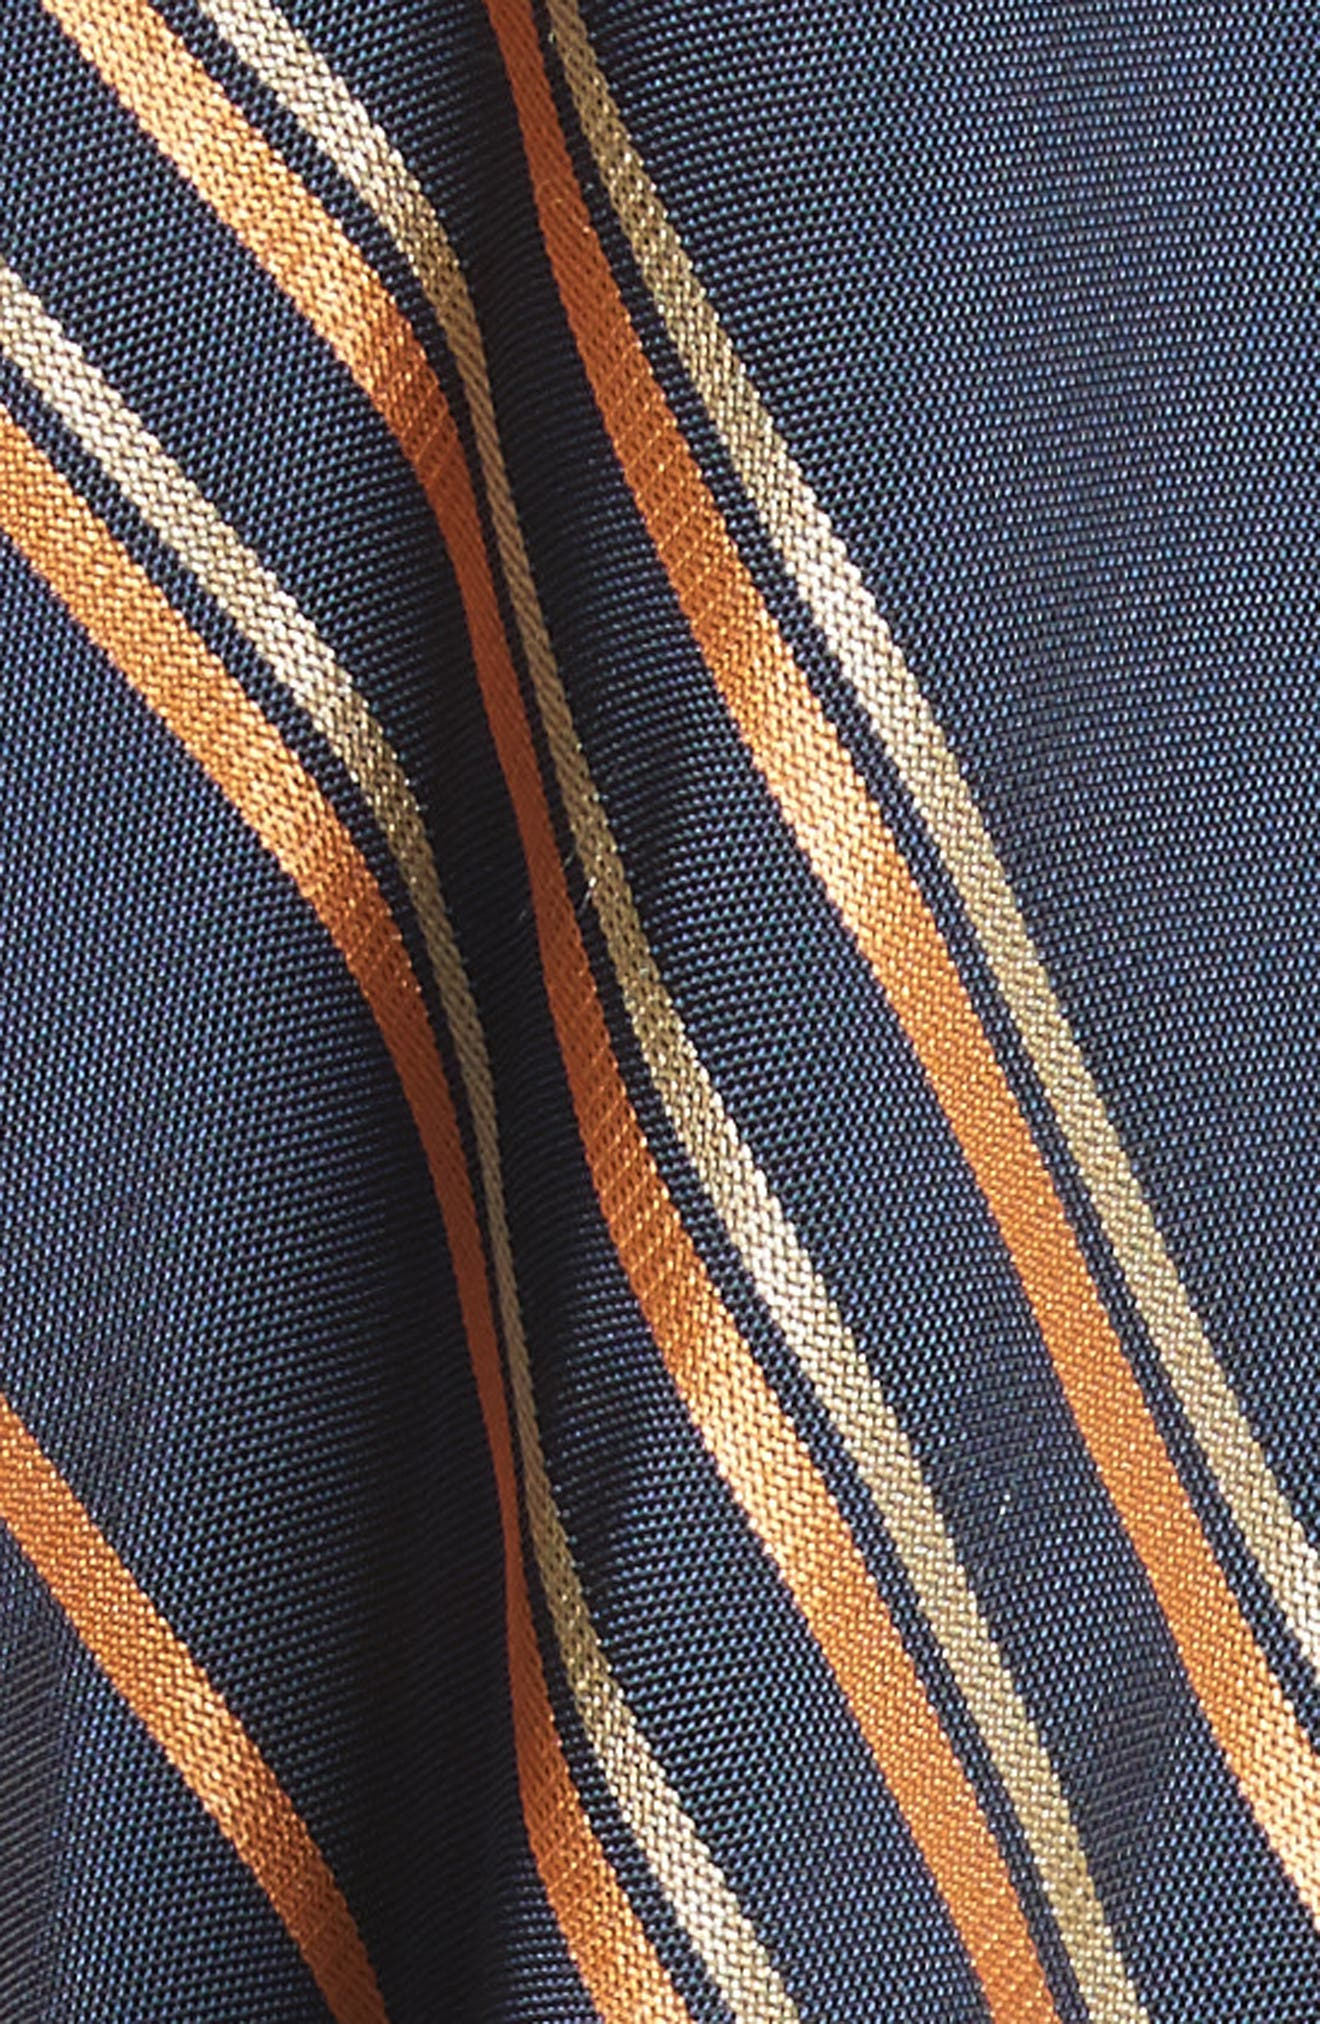 Stripe Dress,                             Alternate thumbnail 5, color,